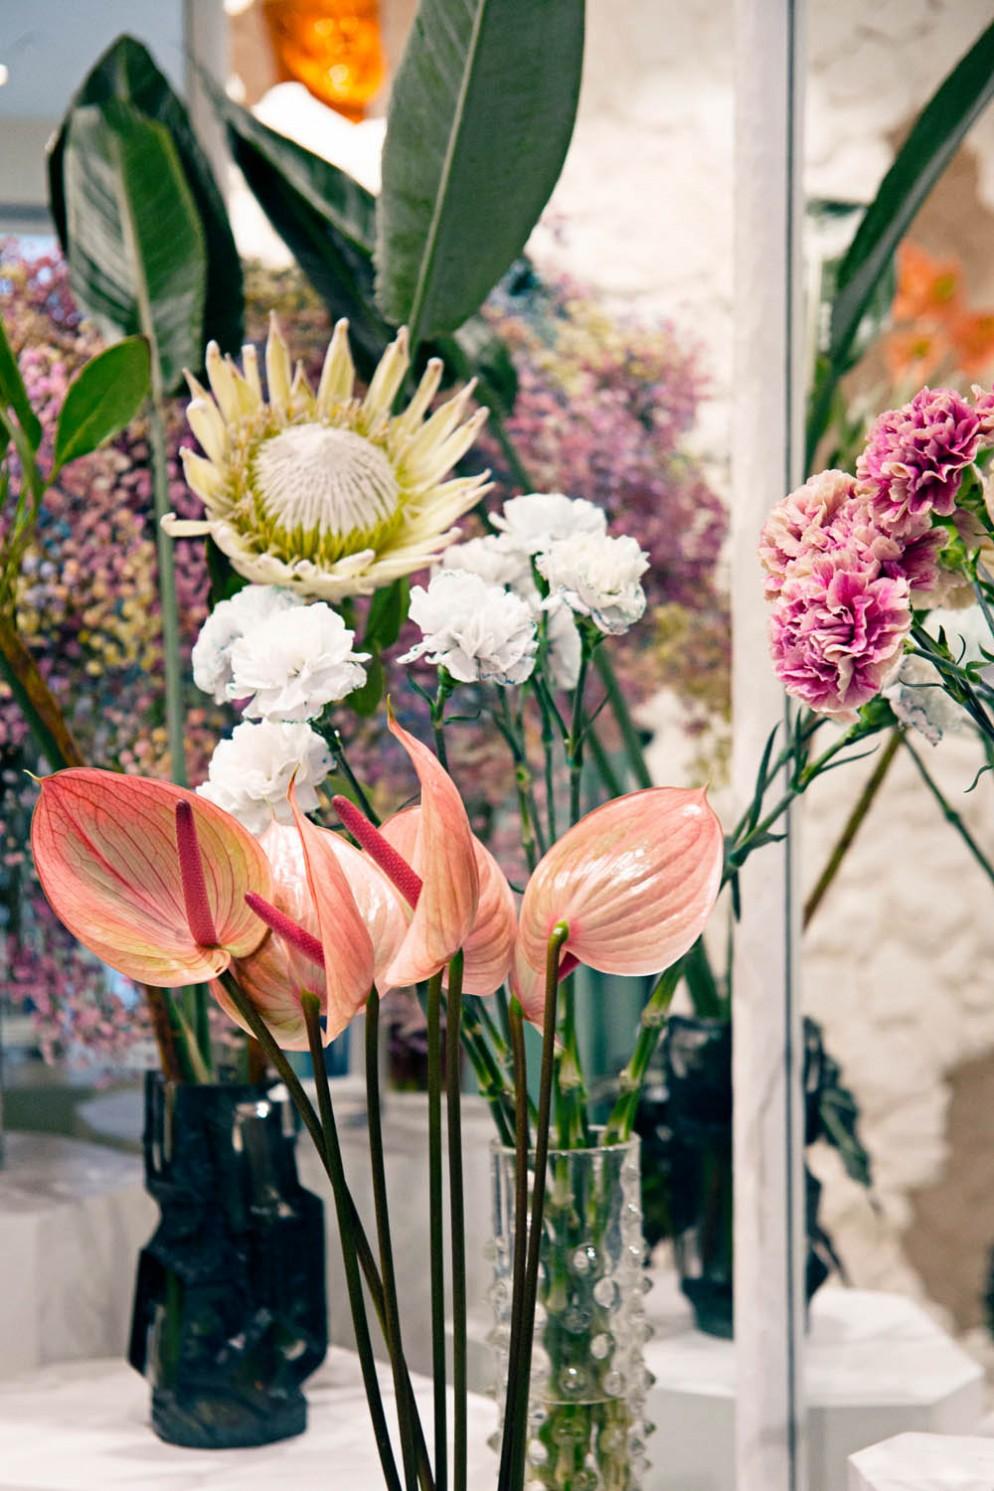 sophie-dries-boutique-floreal-designer-arturo-arita-ville lumiere-08